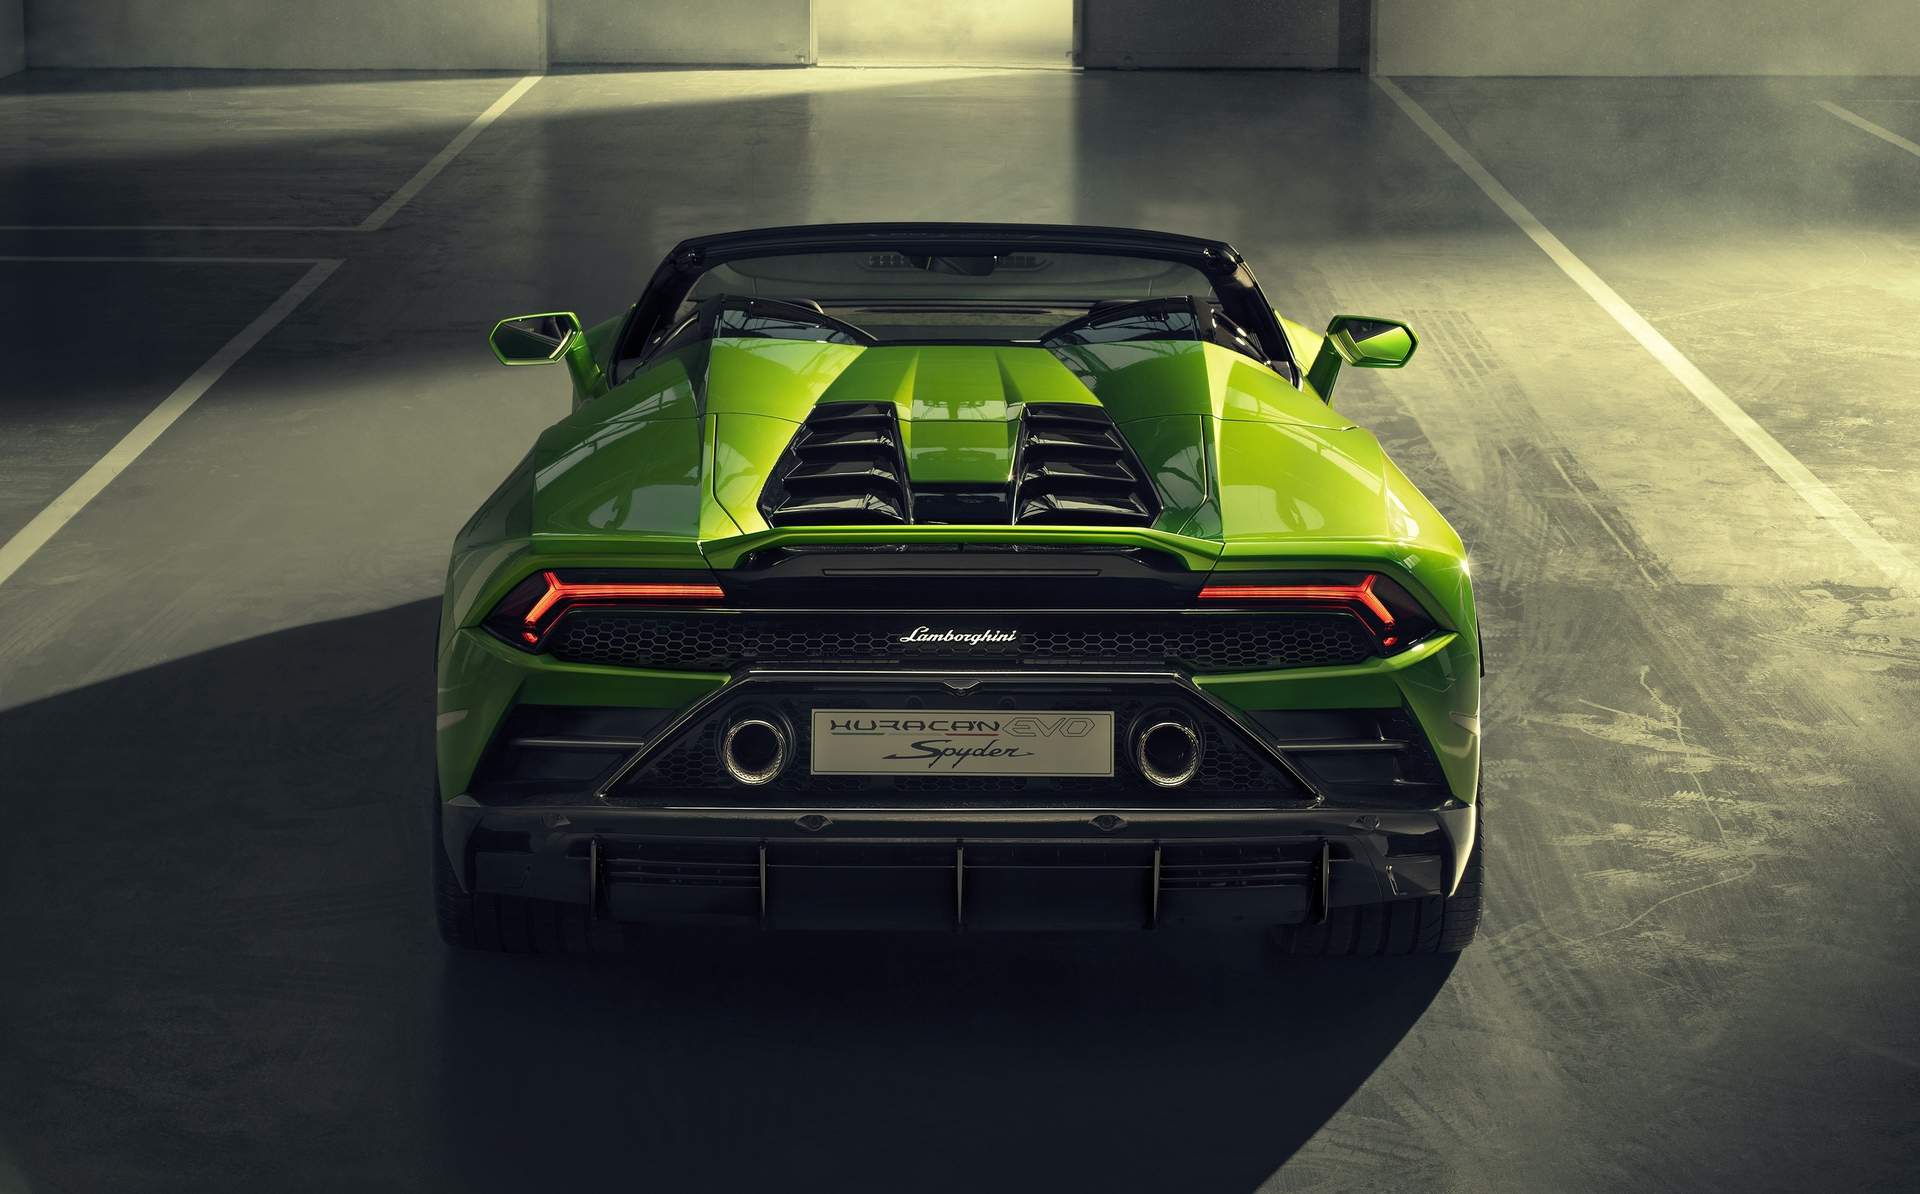 Lamborghini_Huracan_Evo_Spyder_0017